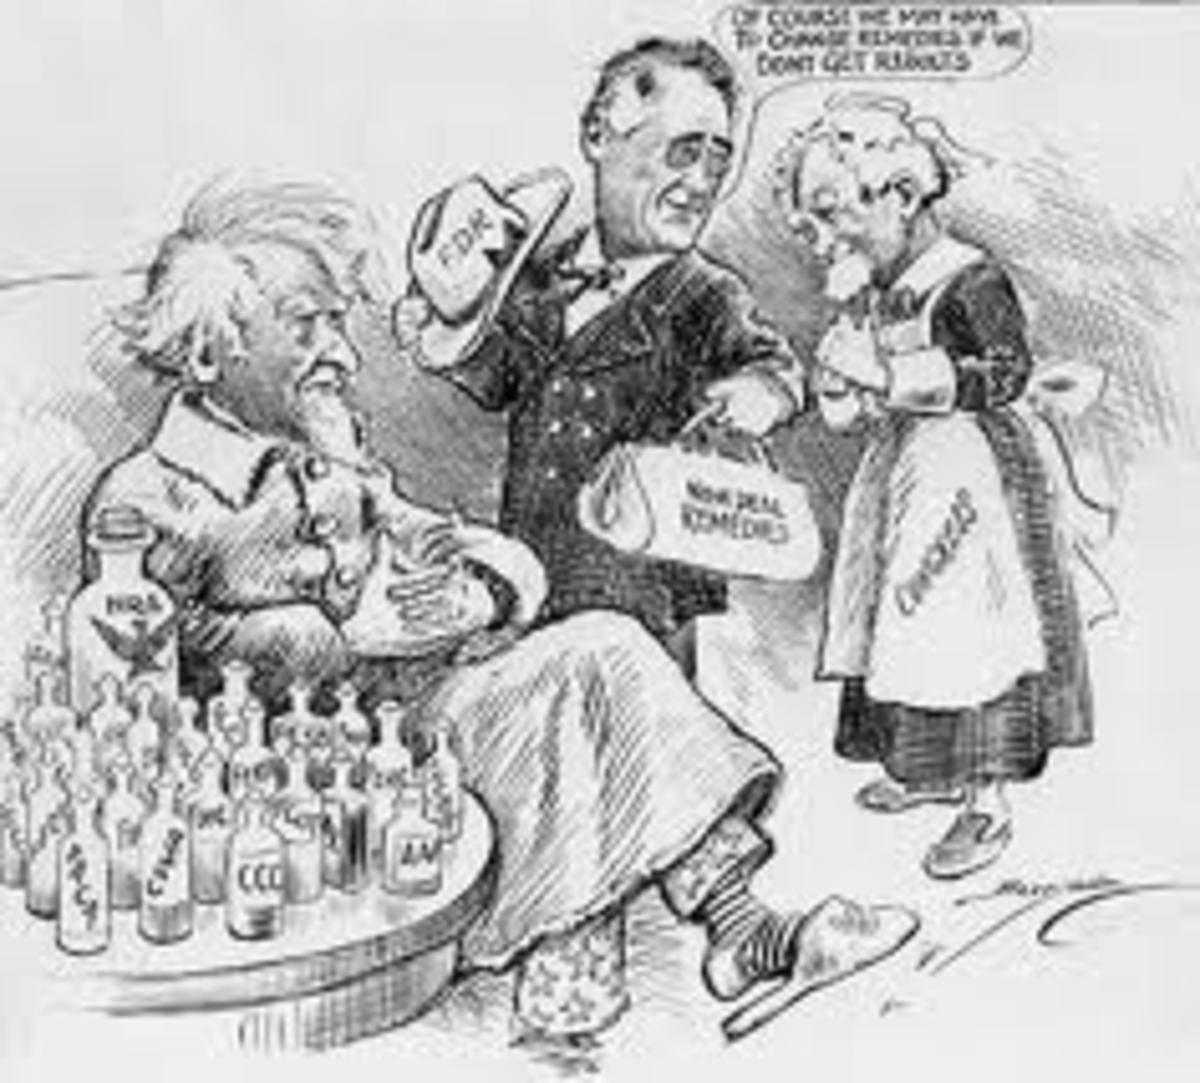 FDR's New deal prescriptions for Uncle Sam were bad medicine!